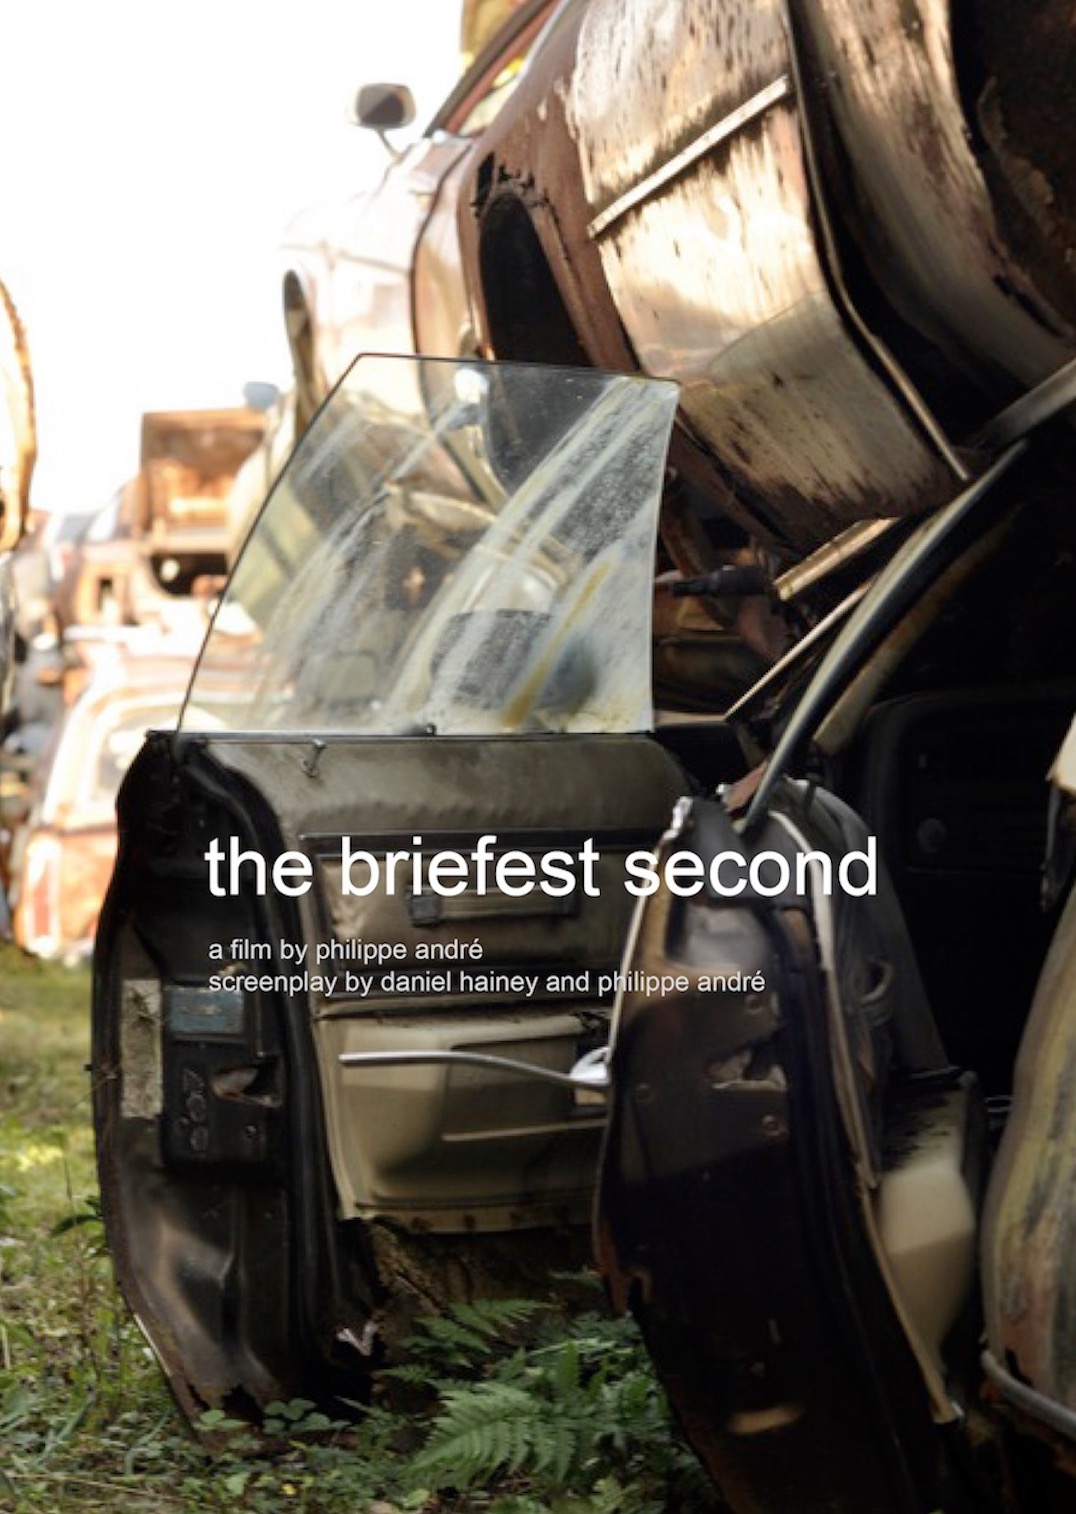 TheBriefestSecond.jpg